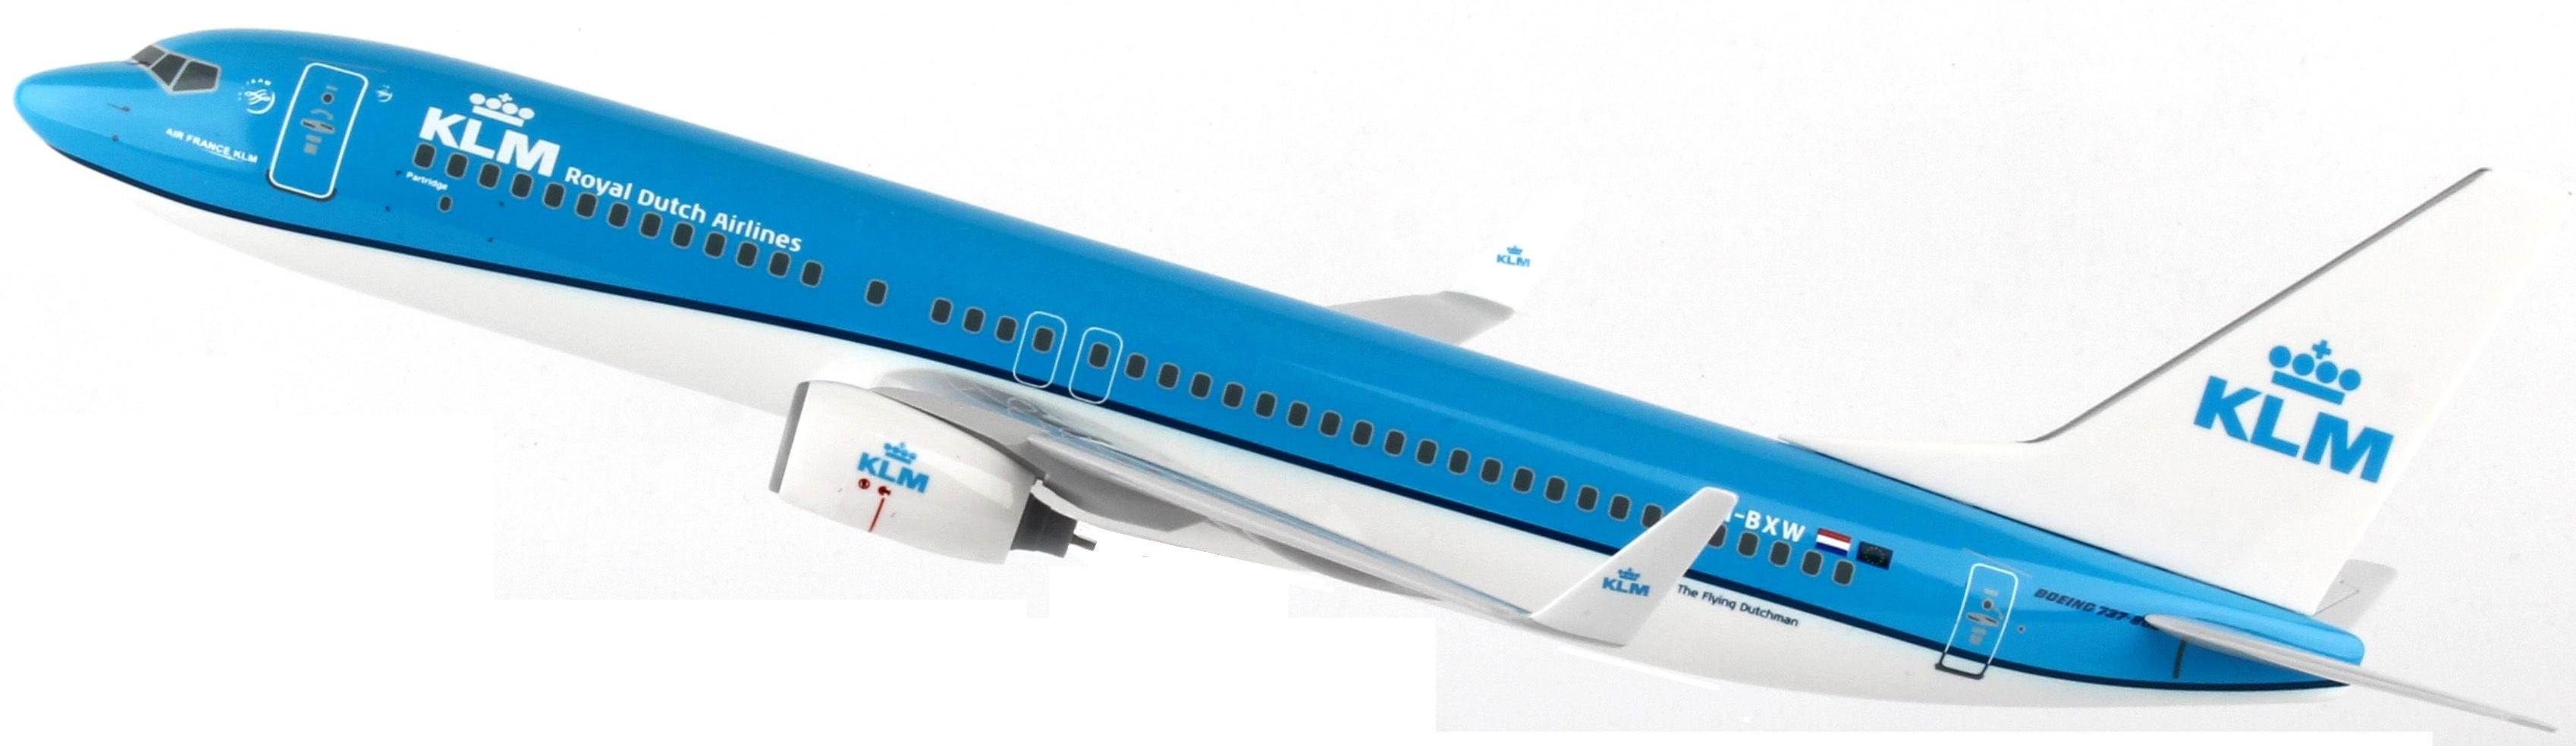 KLM_73780001